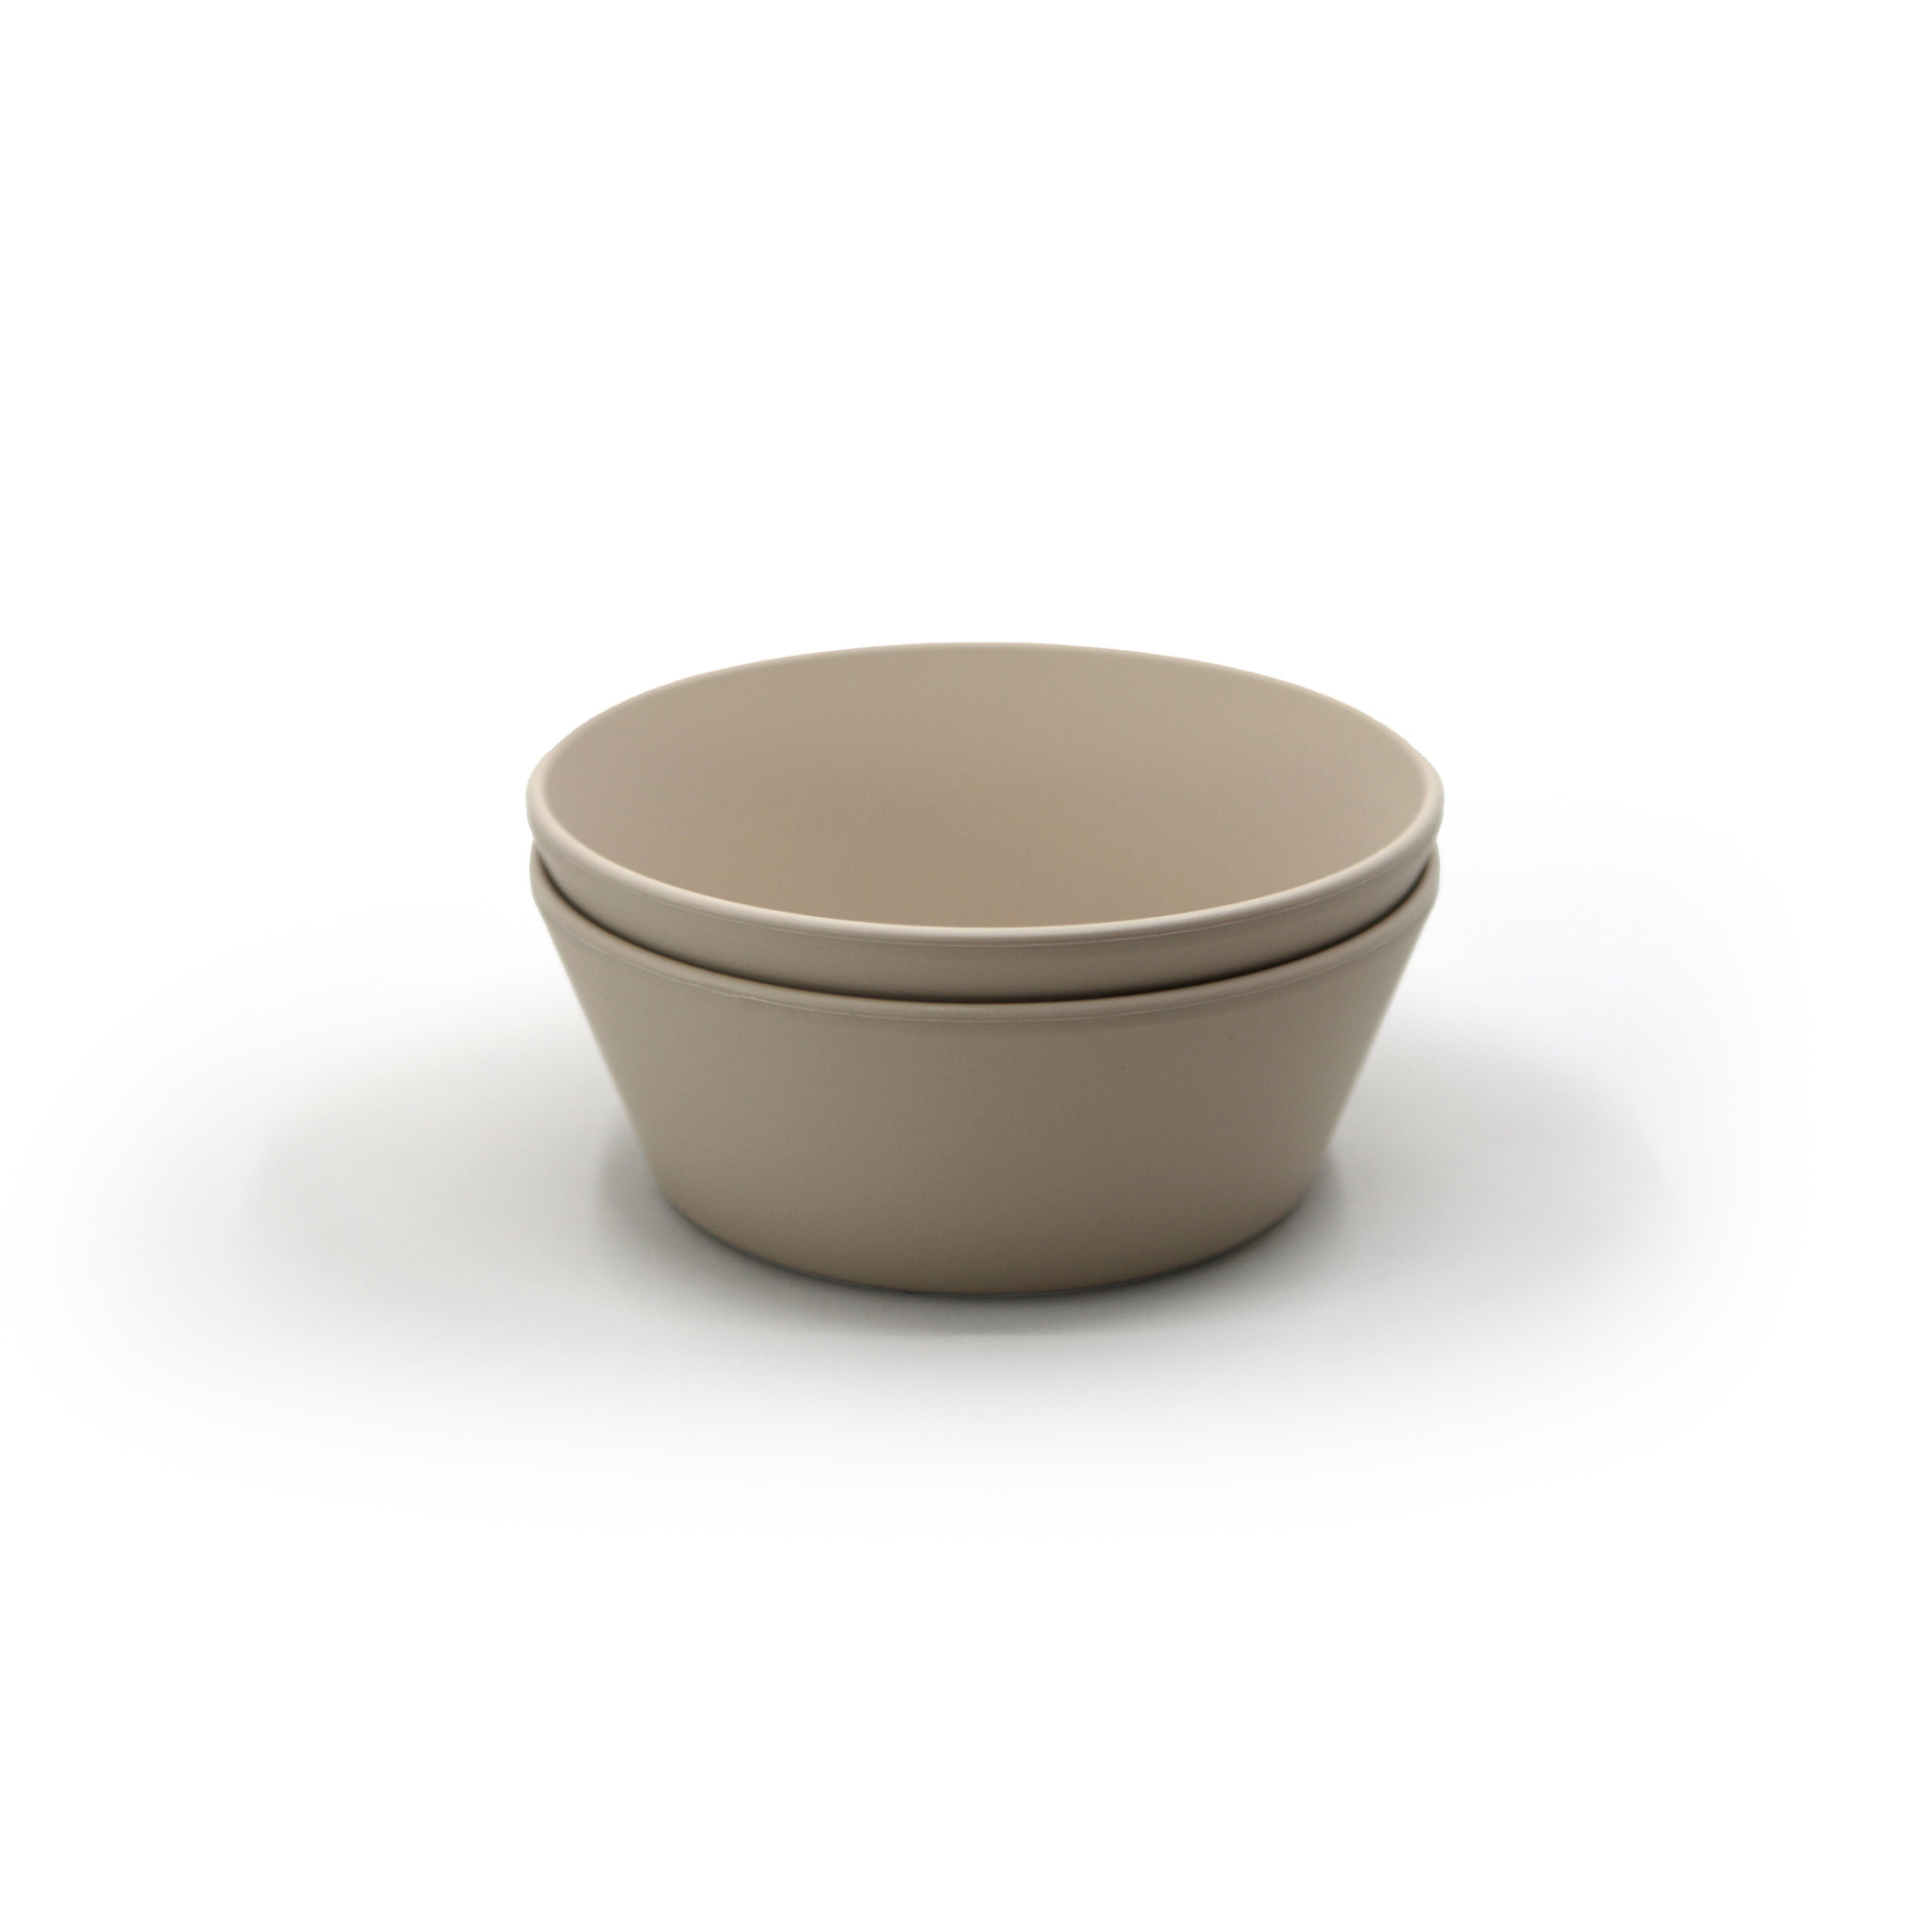 Bowls round 2 pack vanilla-1